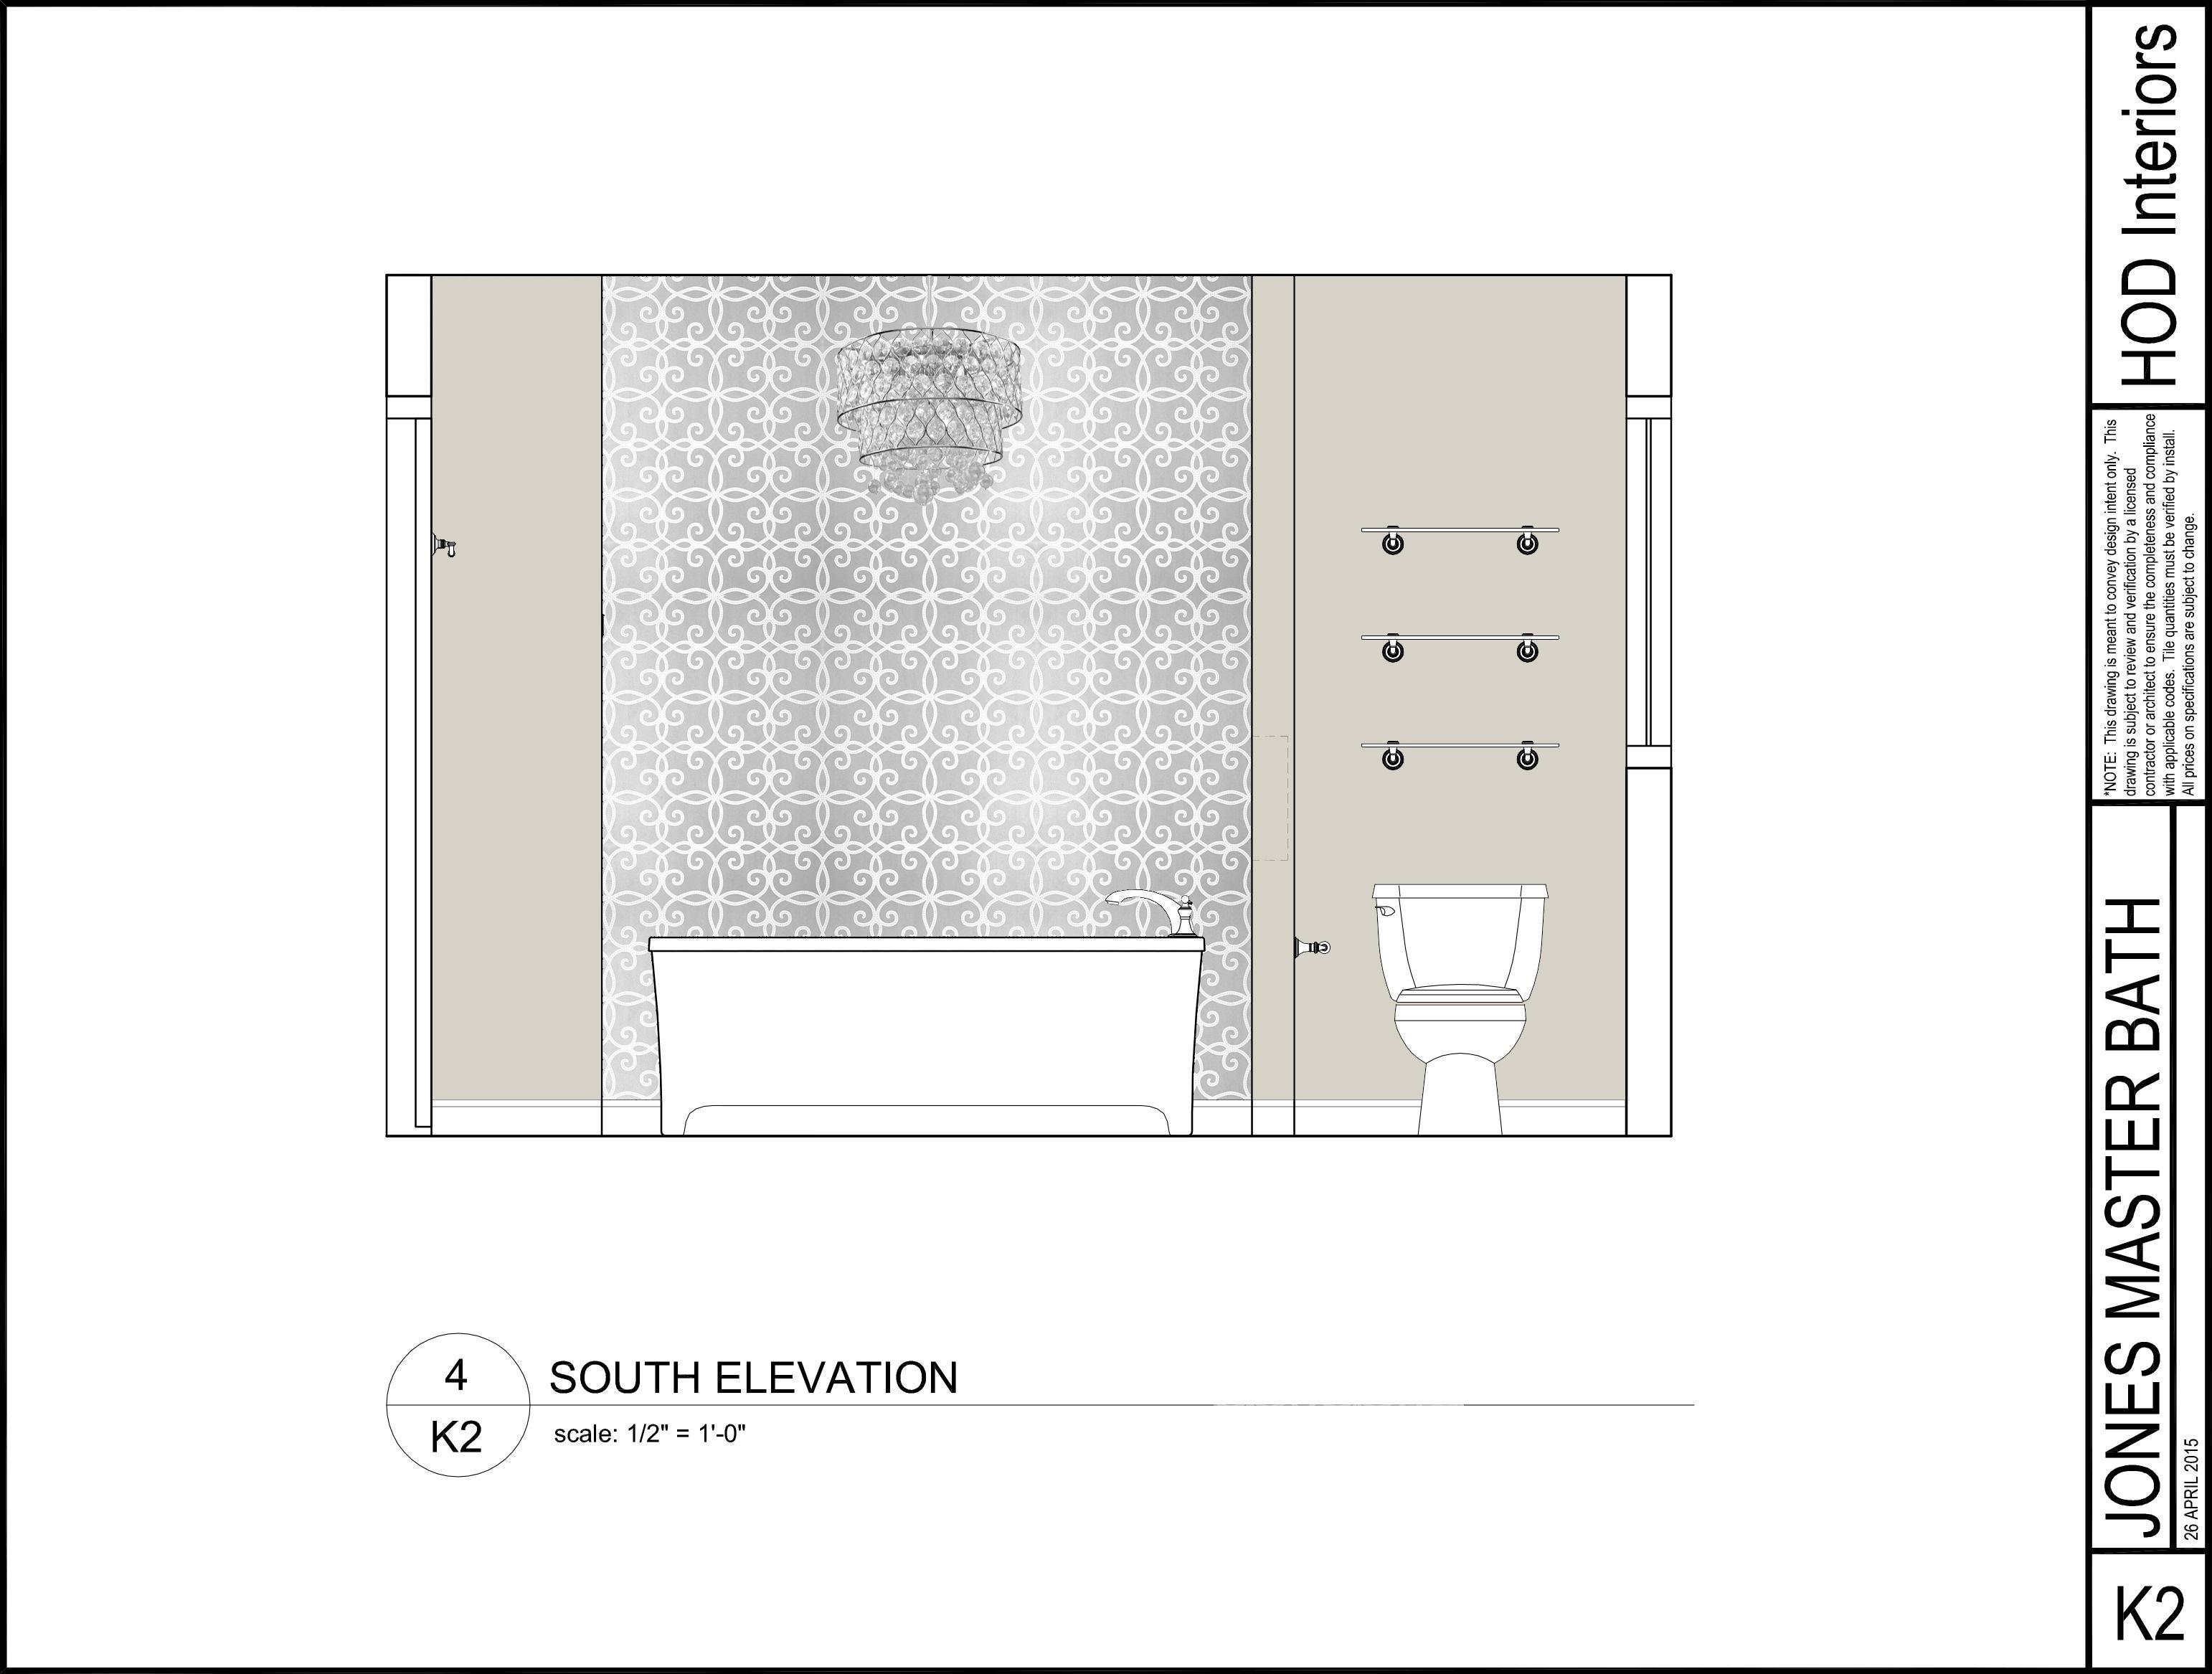 Photoshop Bathtub Elevation Laura Jones Design Service